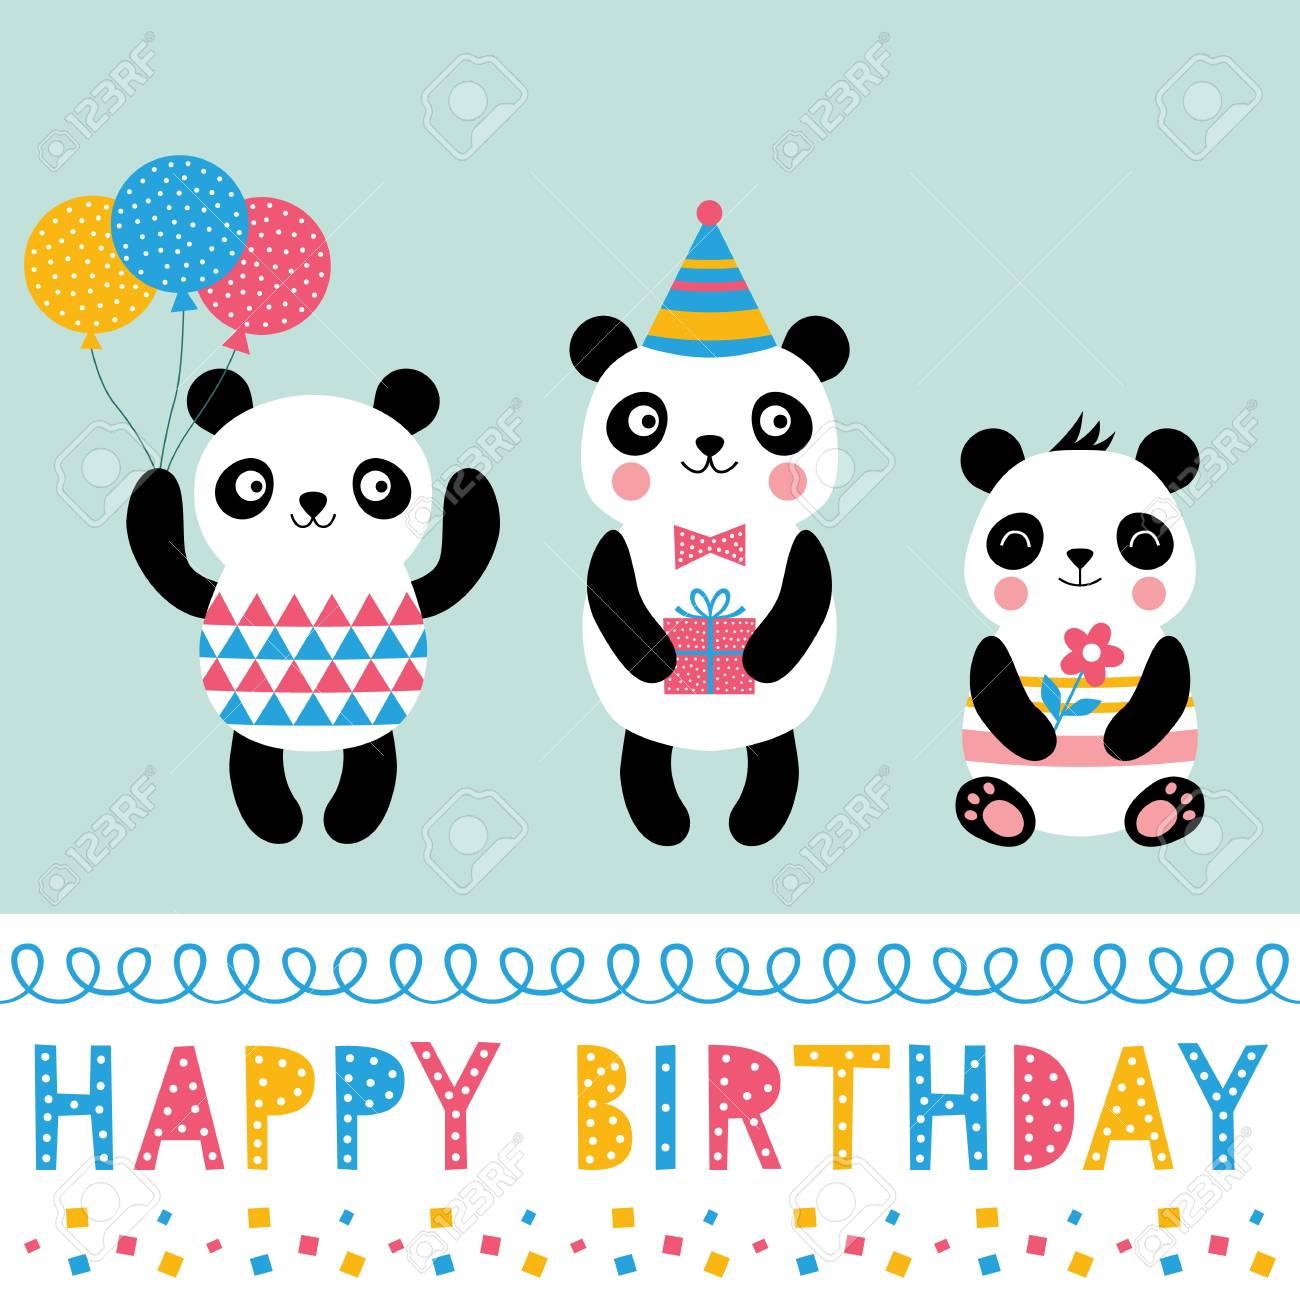 Birthday Greeting Card With Cartoon Panda Bears Royalty Free Cliparts Vectors And Stock Illustration Image 127095968